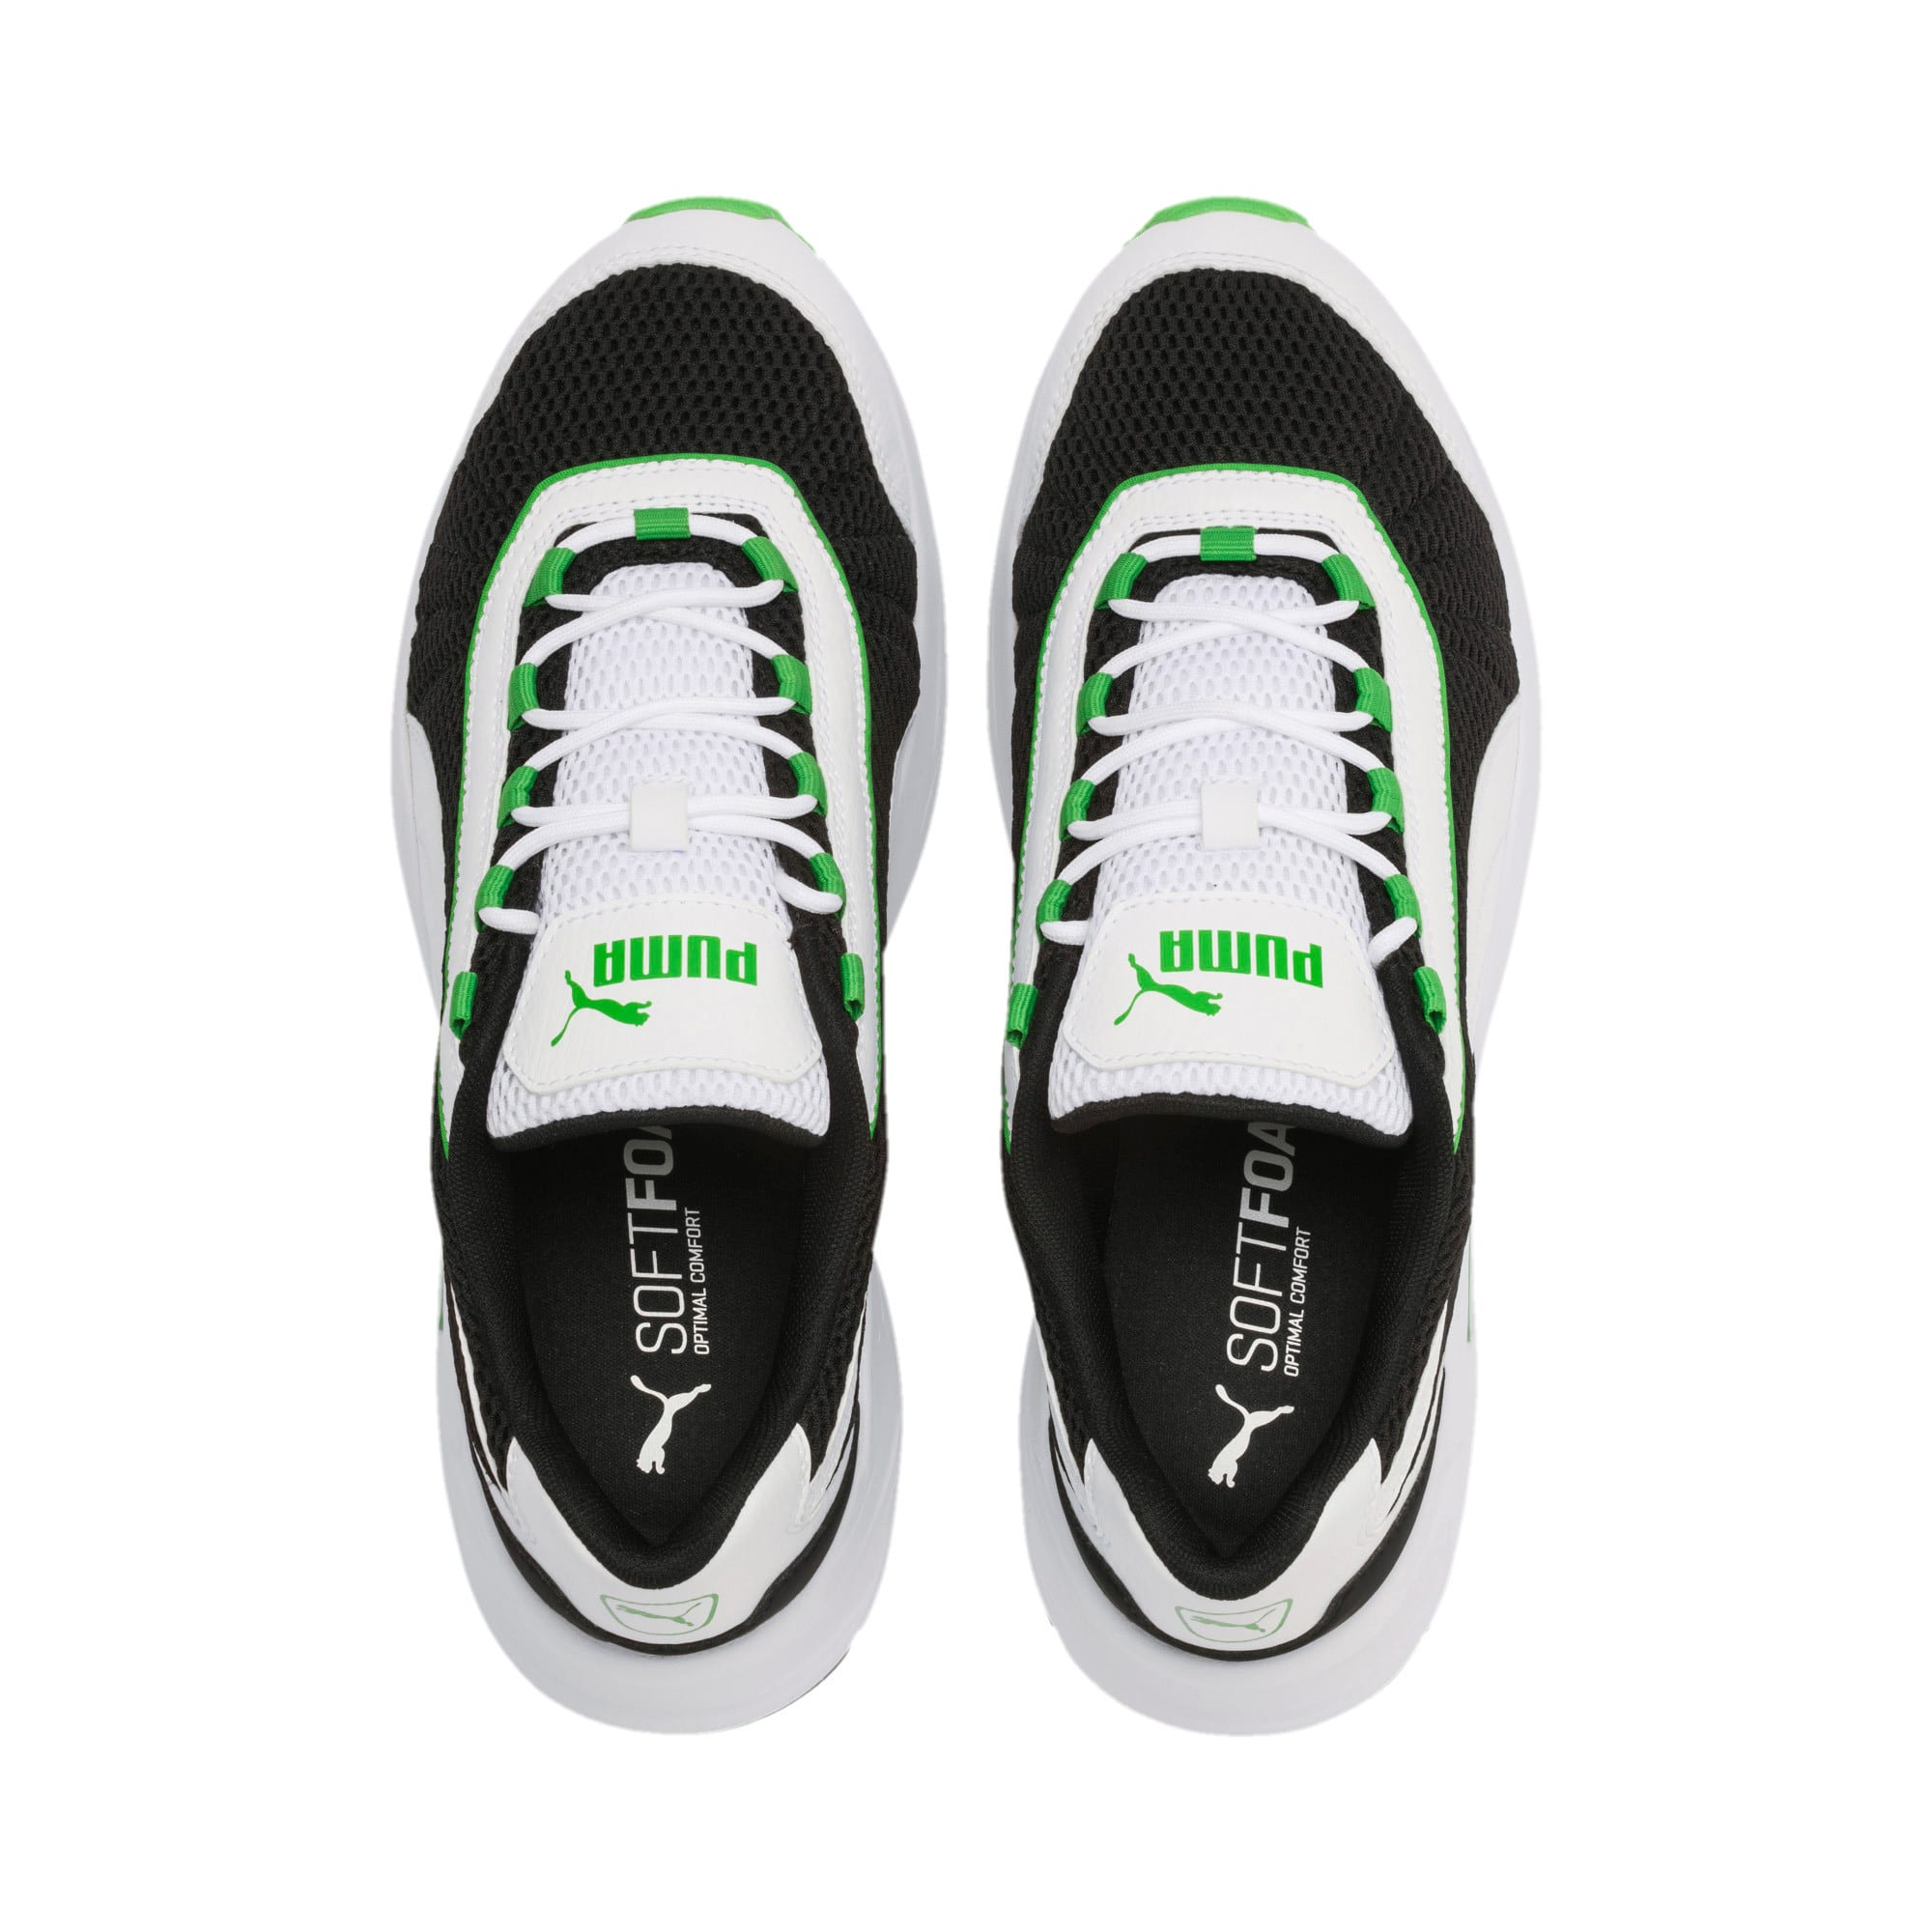 Imagen en miniatura 7 de Zapatillas de training Nucleus, Puma Black-Classic Green, mediana